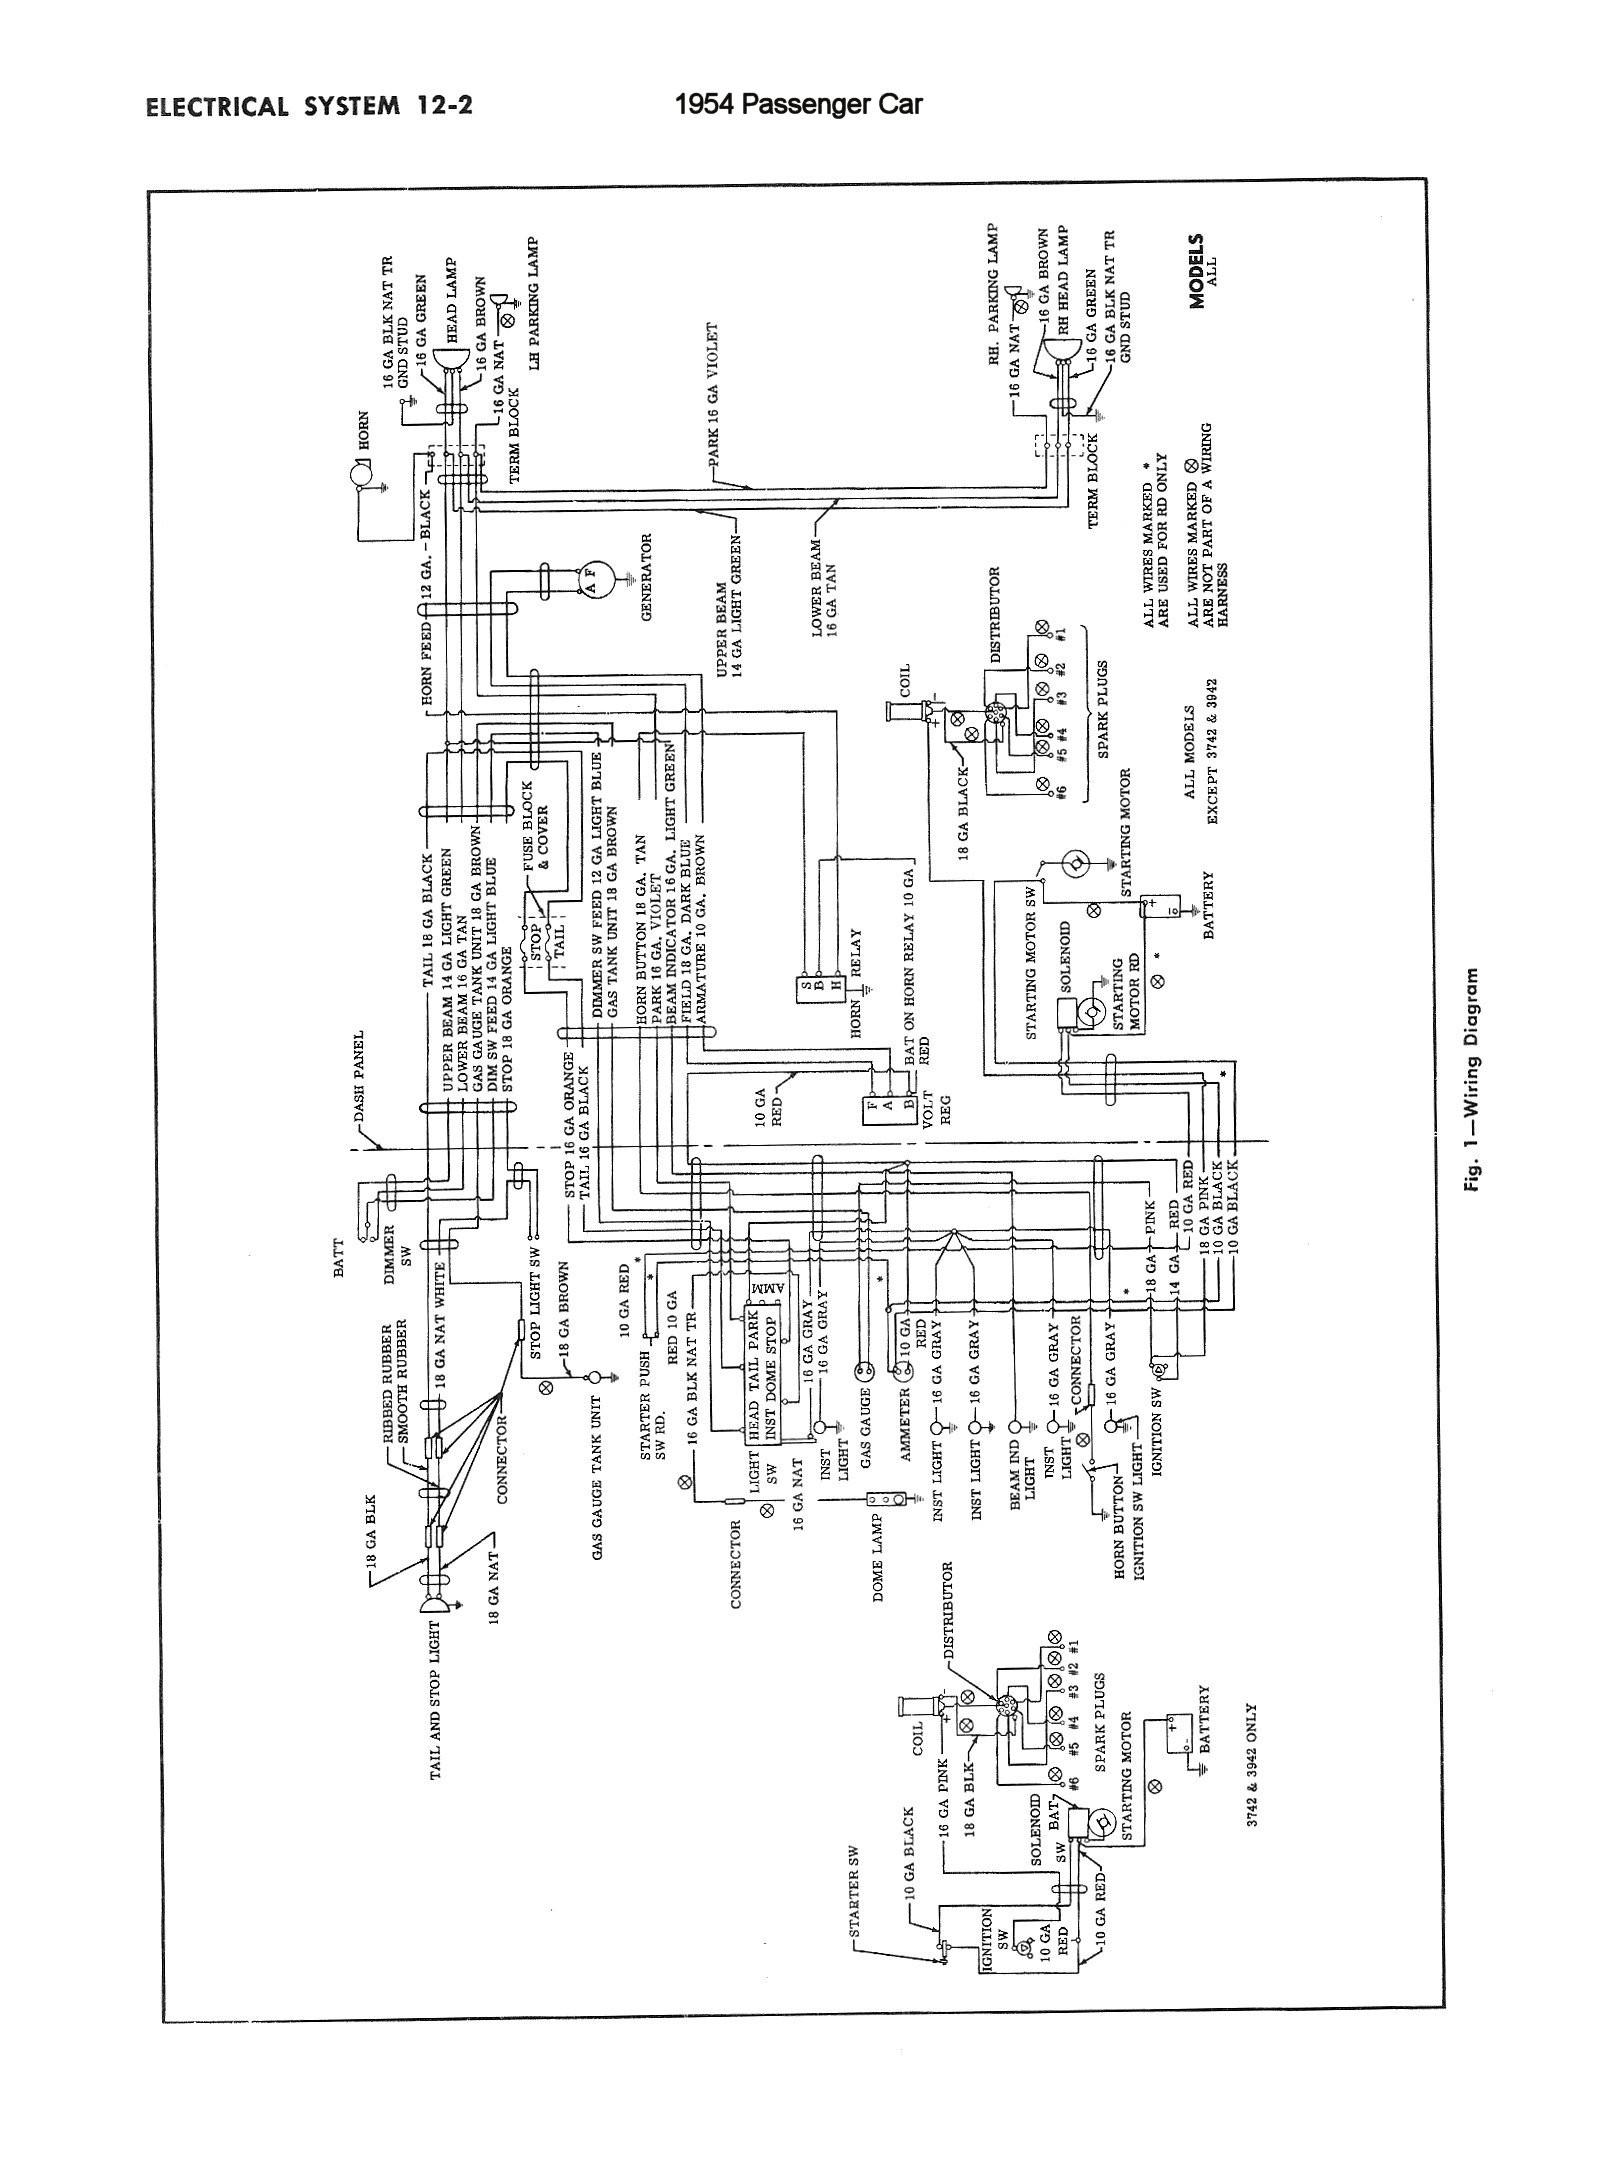 1954 Truck Wiring · 1954 Passenger Car Wiring 3